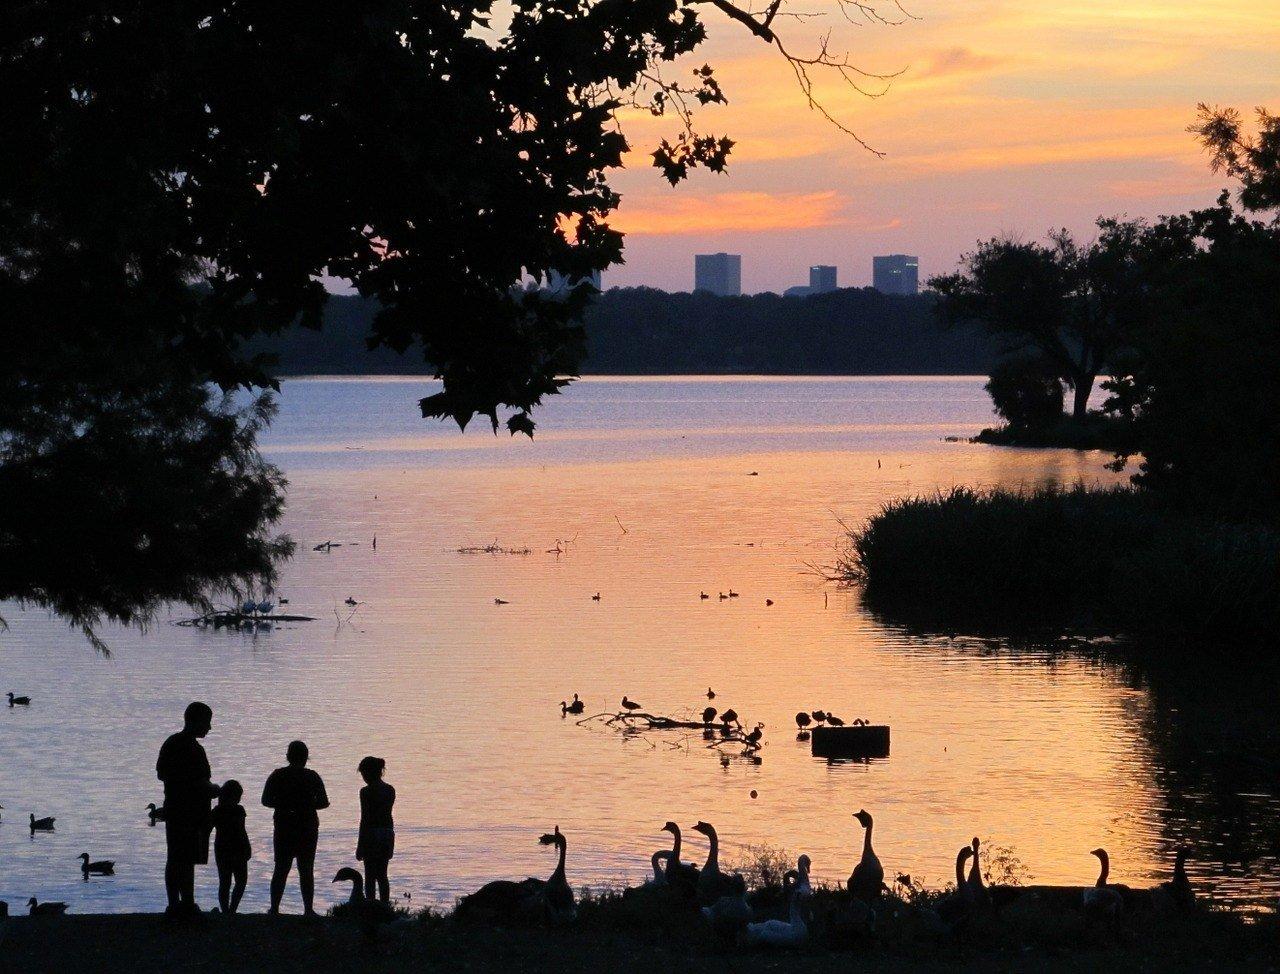 sunset on a lake near dallas travel guide